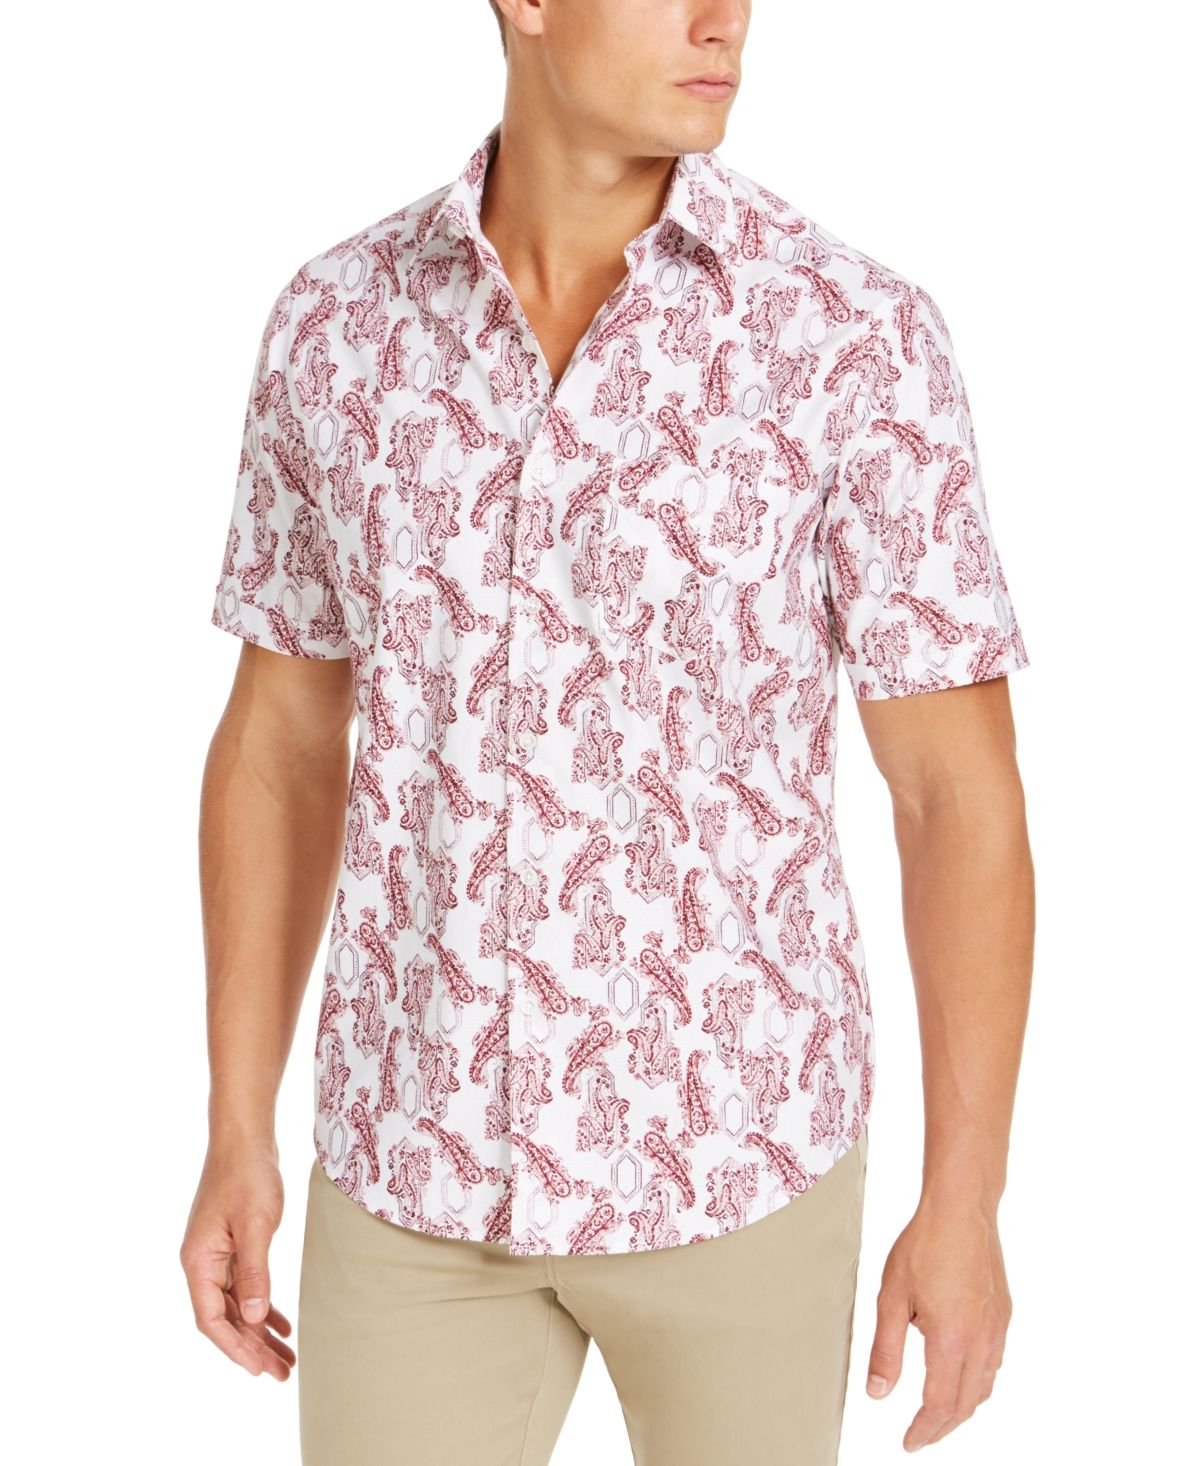 Tasso Elba Printed Woven Long Sleeve Button Down Shirt